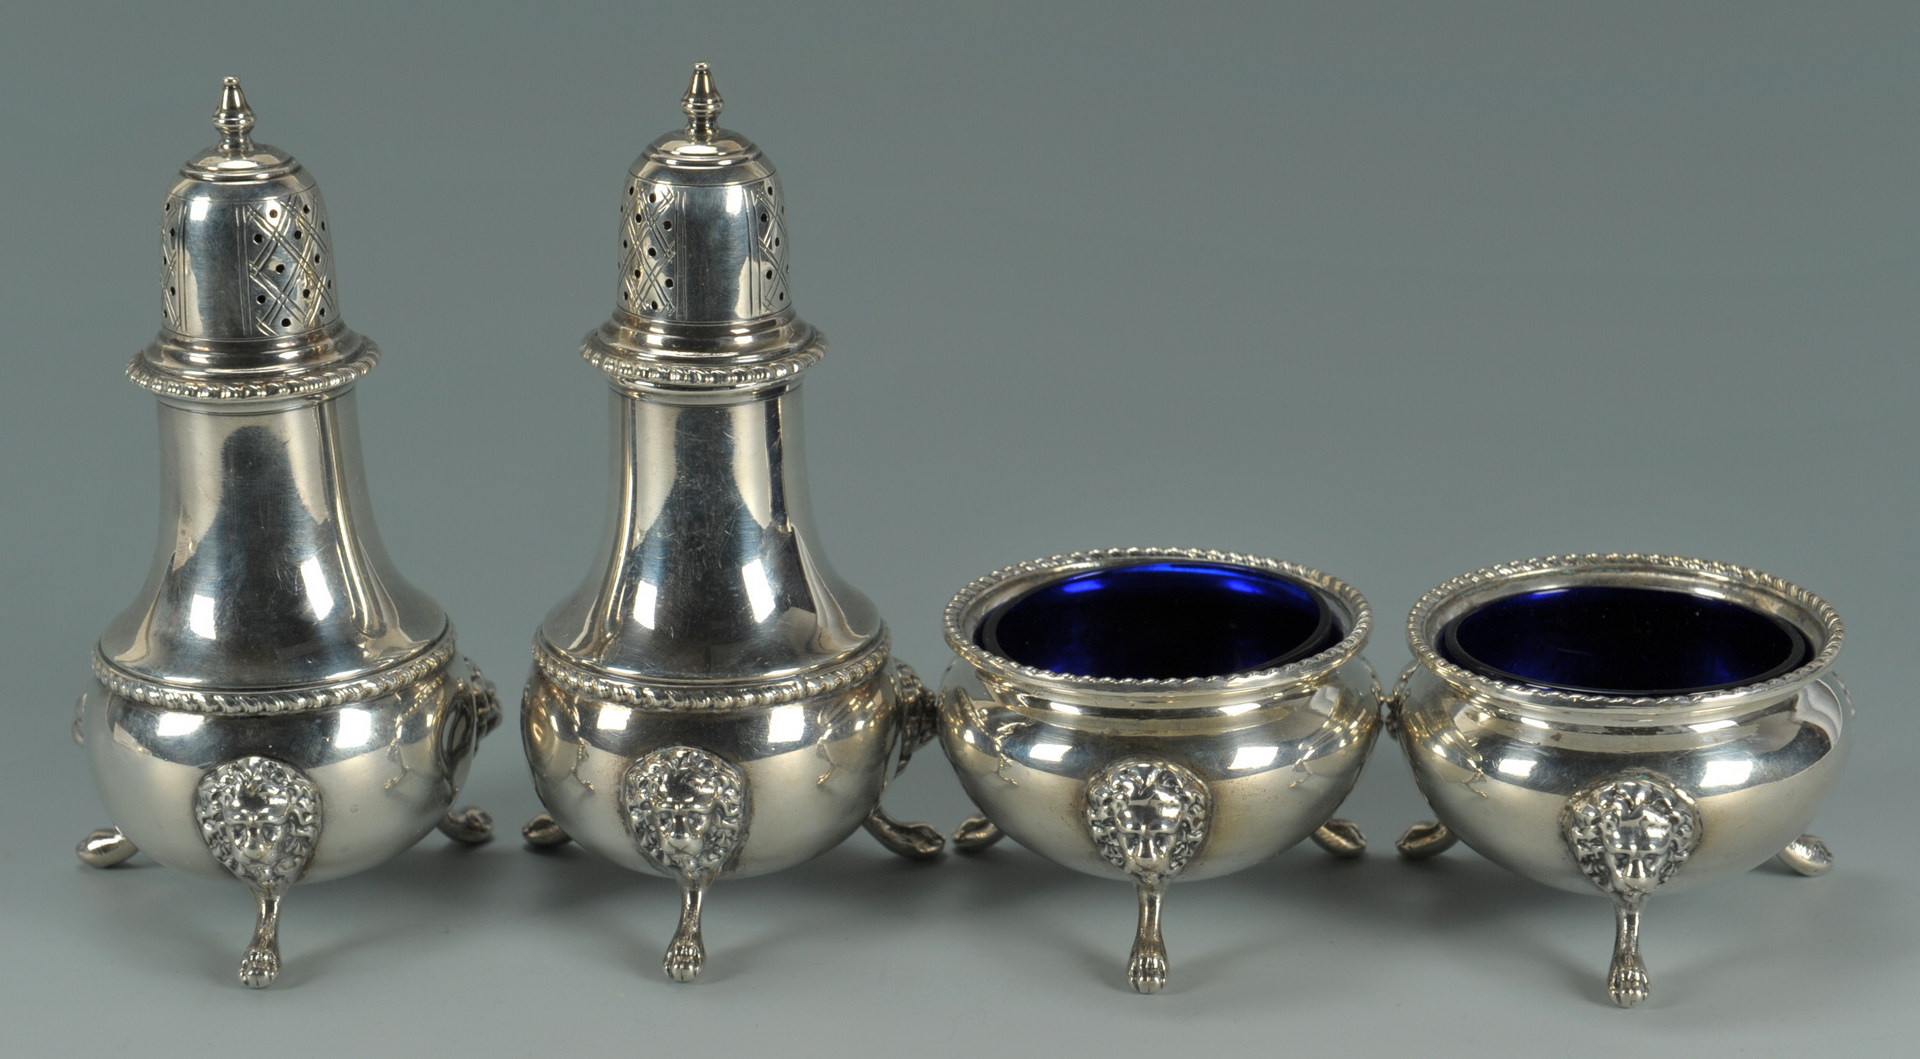 Lot 499: Silver salt items and assorted flatware, 12 pcs